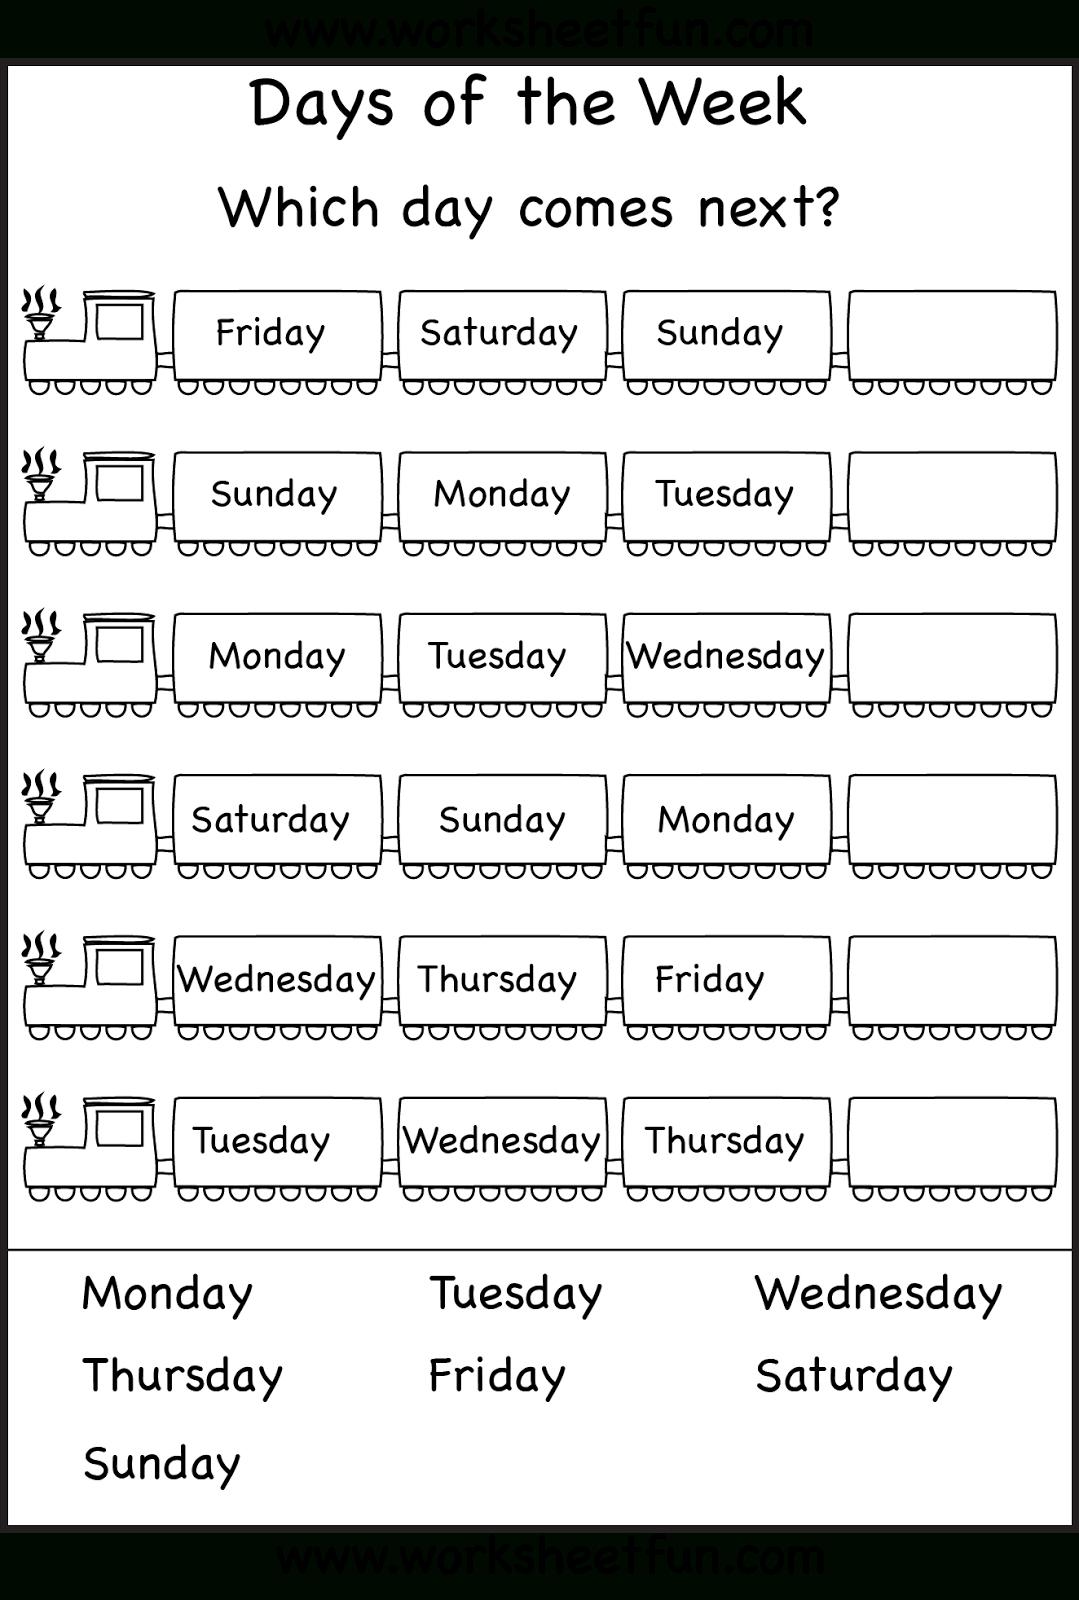 Exploradores!!!: Septiembre 2014 Calendar For The Next 2 Weeks